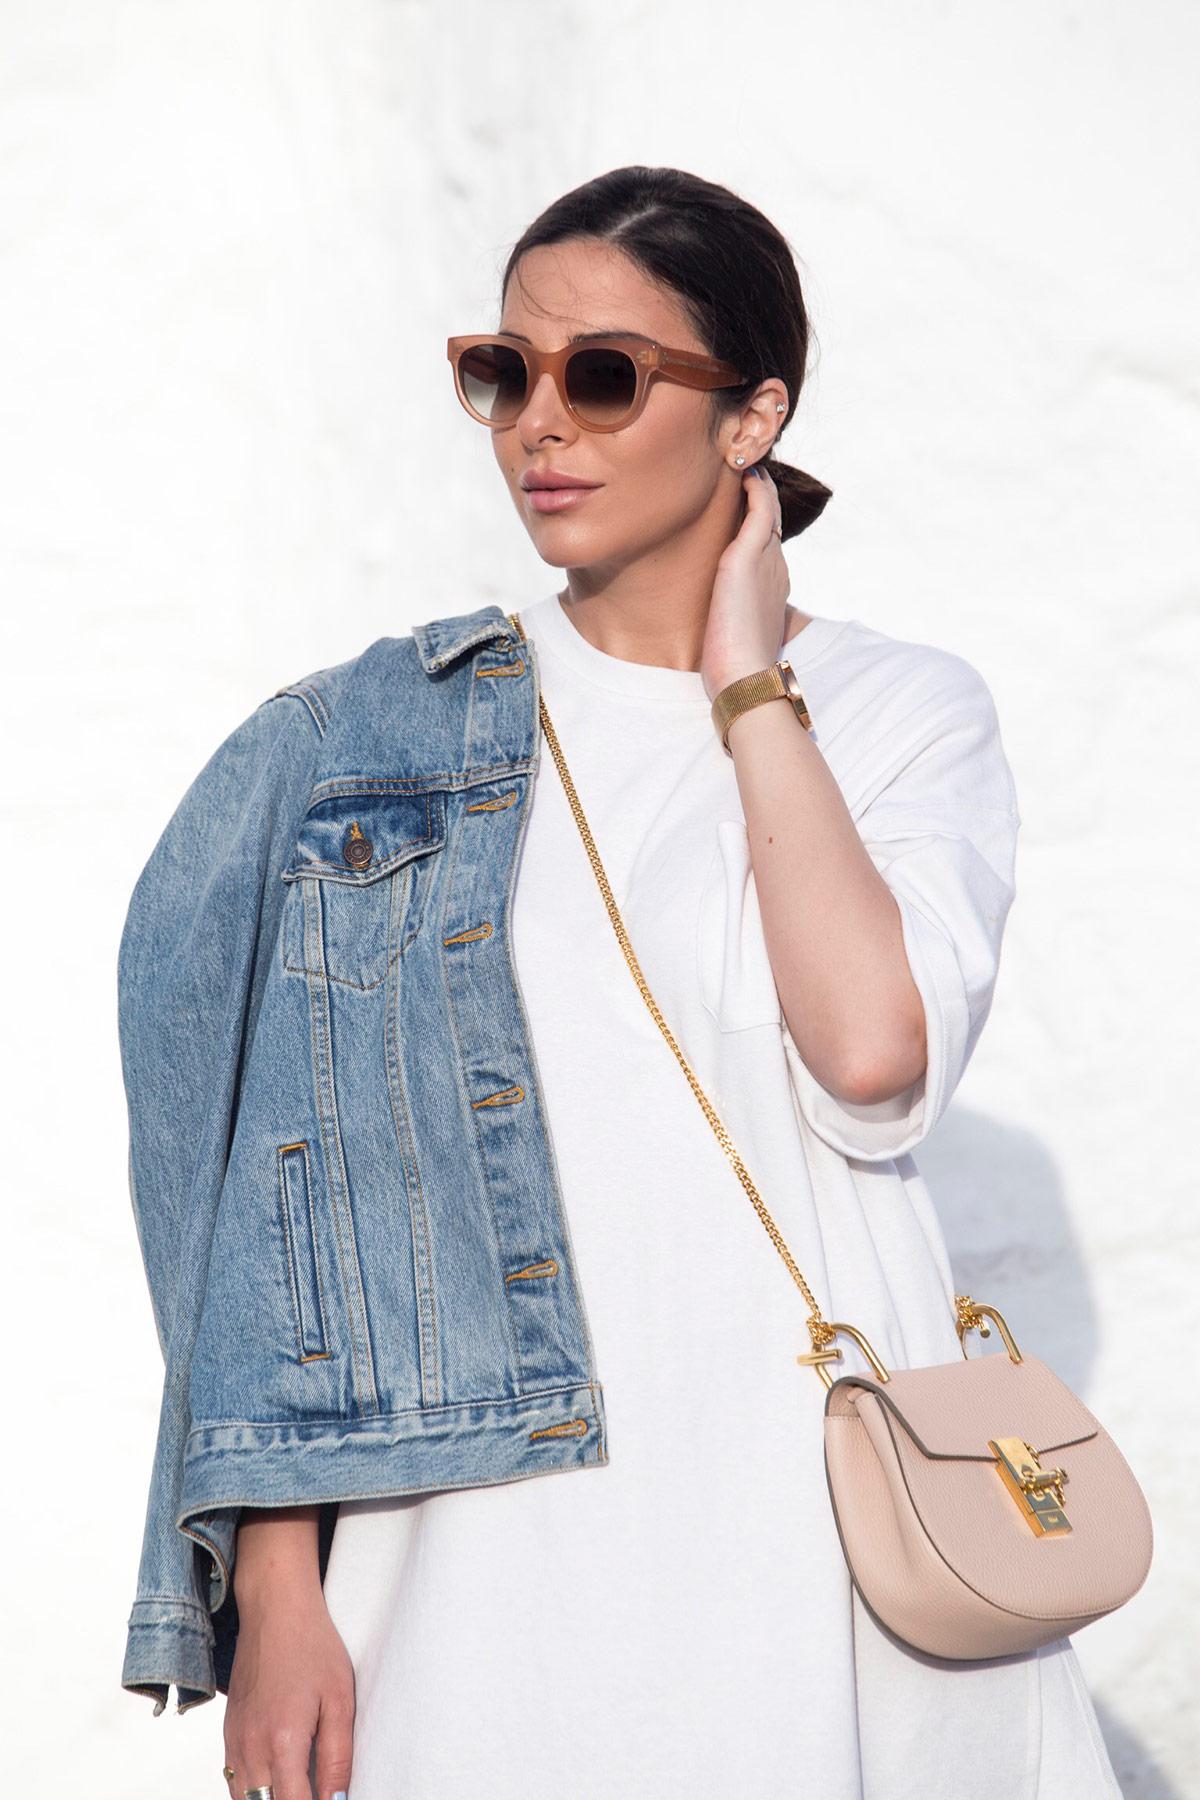 Chloe Drew bag mini, Celine sunglasses, denim jacket and gladiator sandals as seen at Stella Asteria | Fashion & Lifestyle Blogger